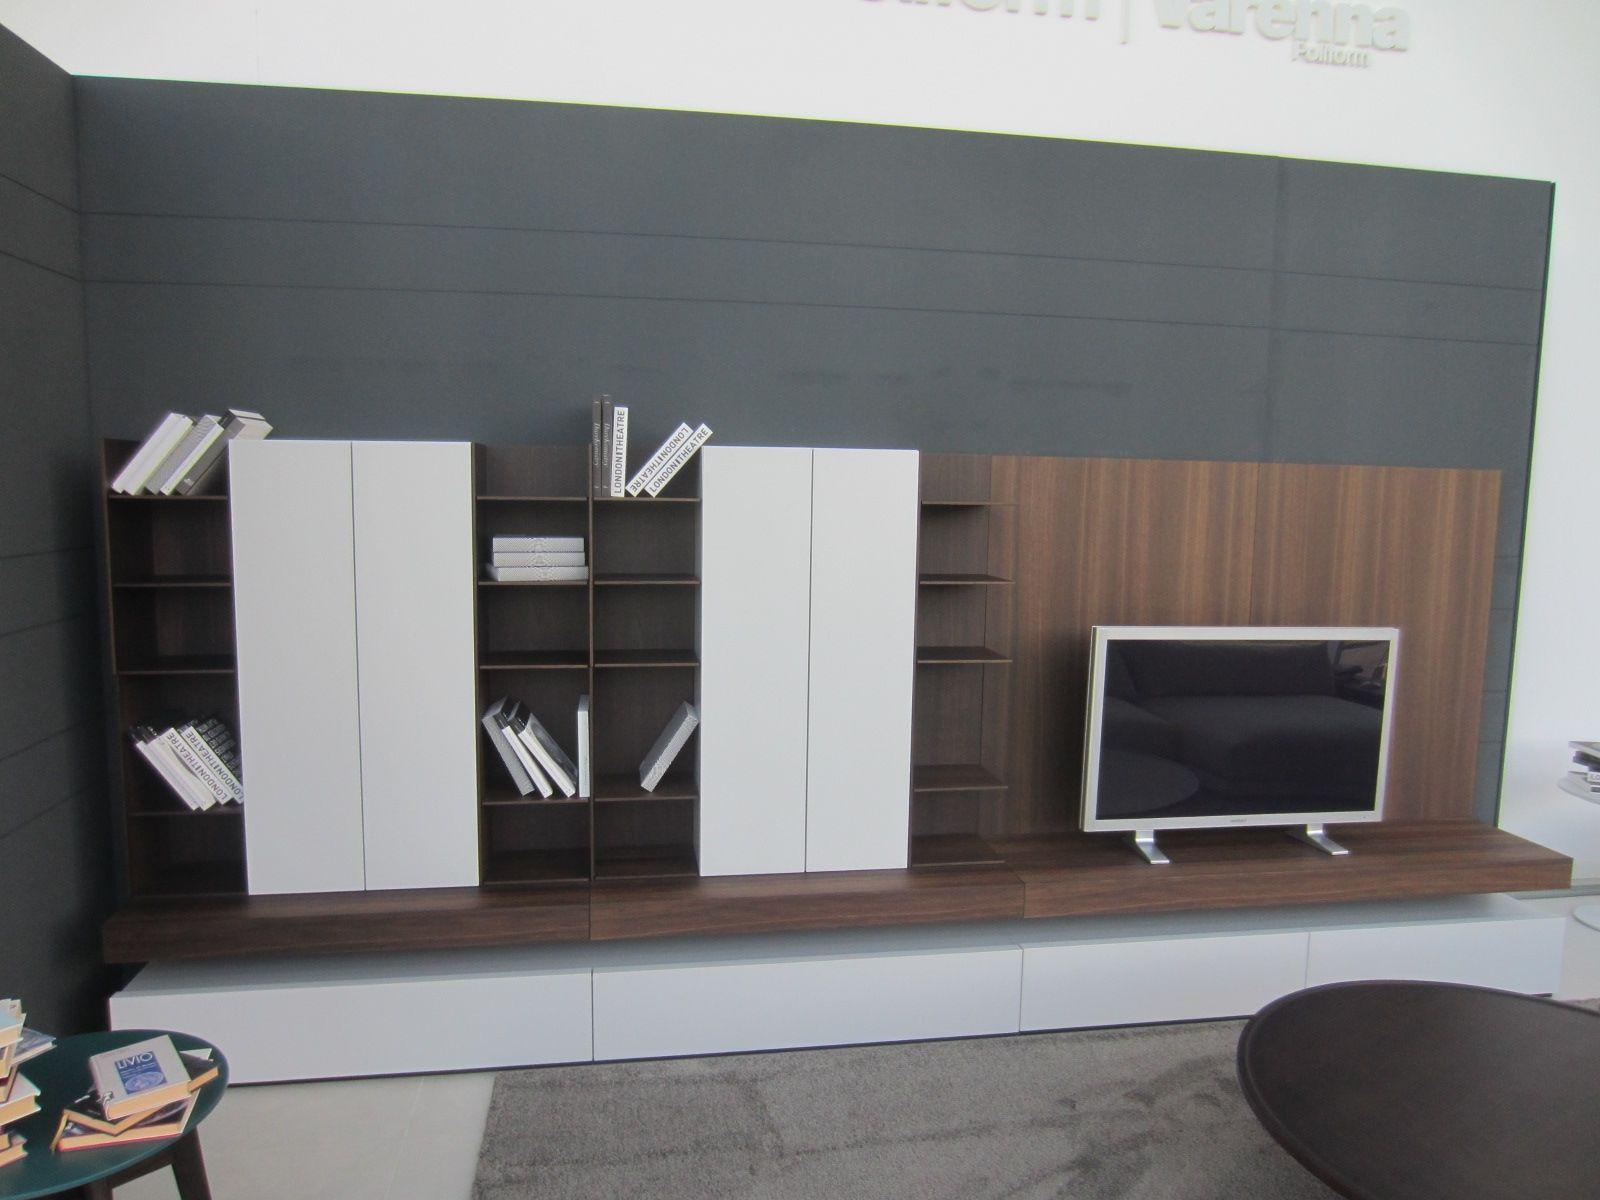 Awesome Soggiorni Poliform Gallery - Modern Home Design - orangetech.us